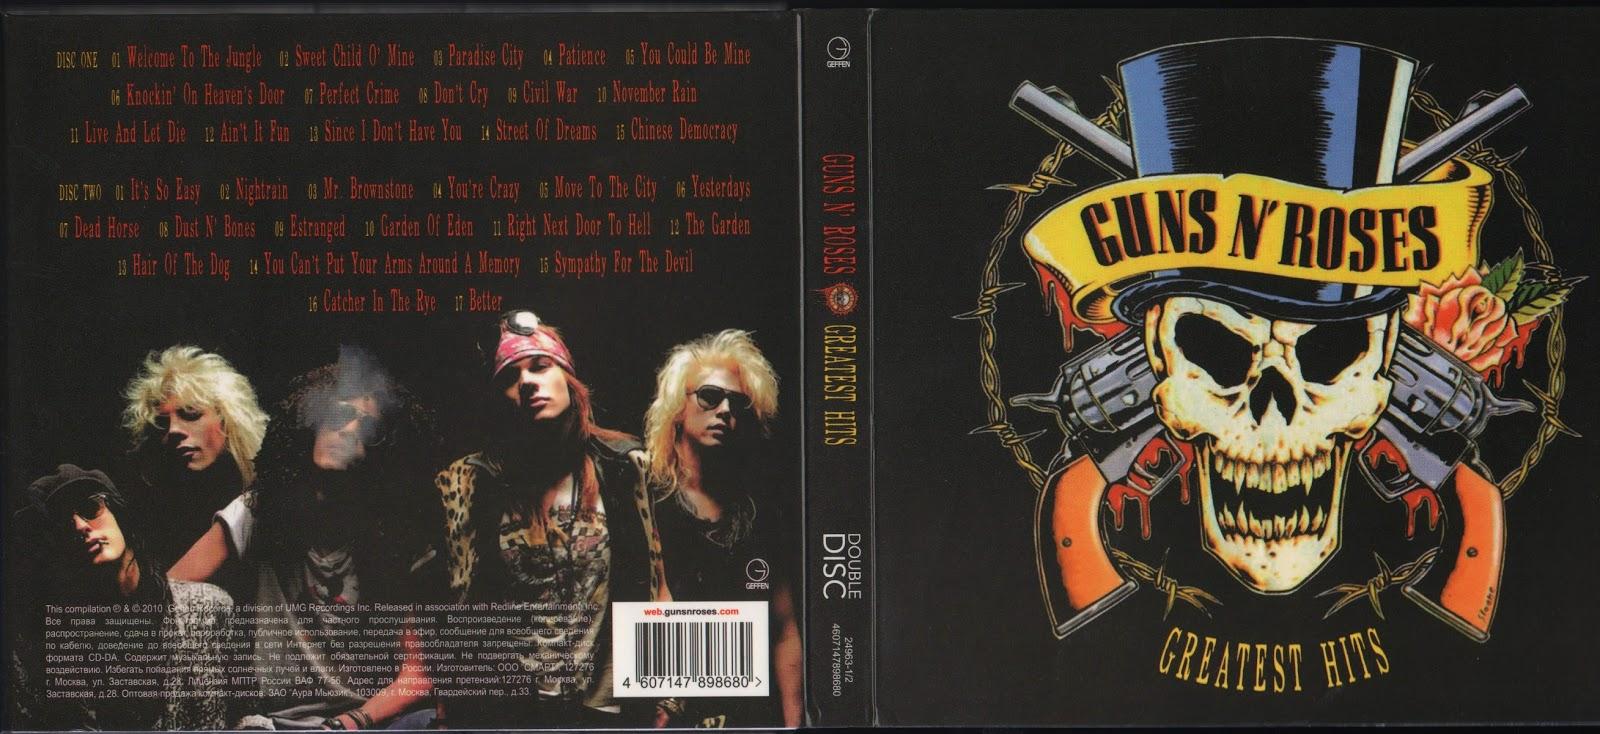 Guns N' Roses - Greatest Hits [2010] 320 kbps